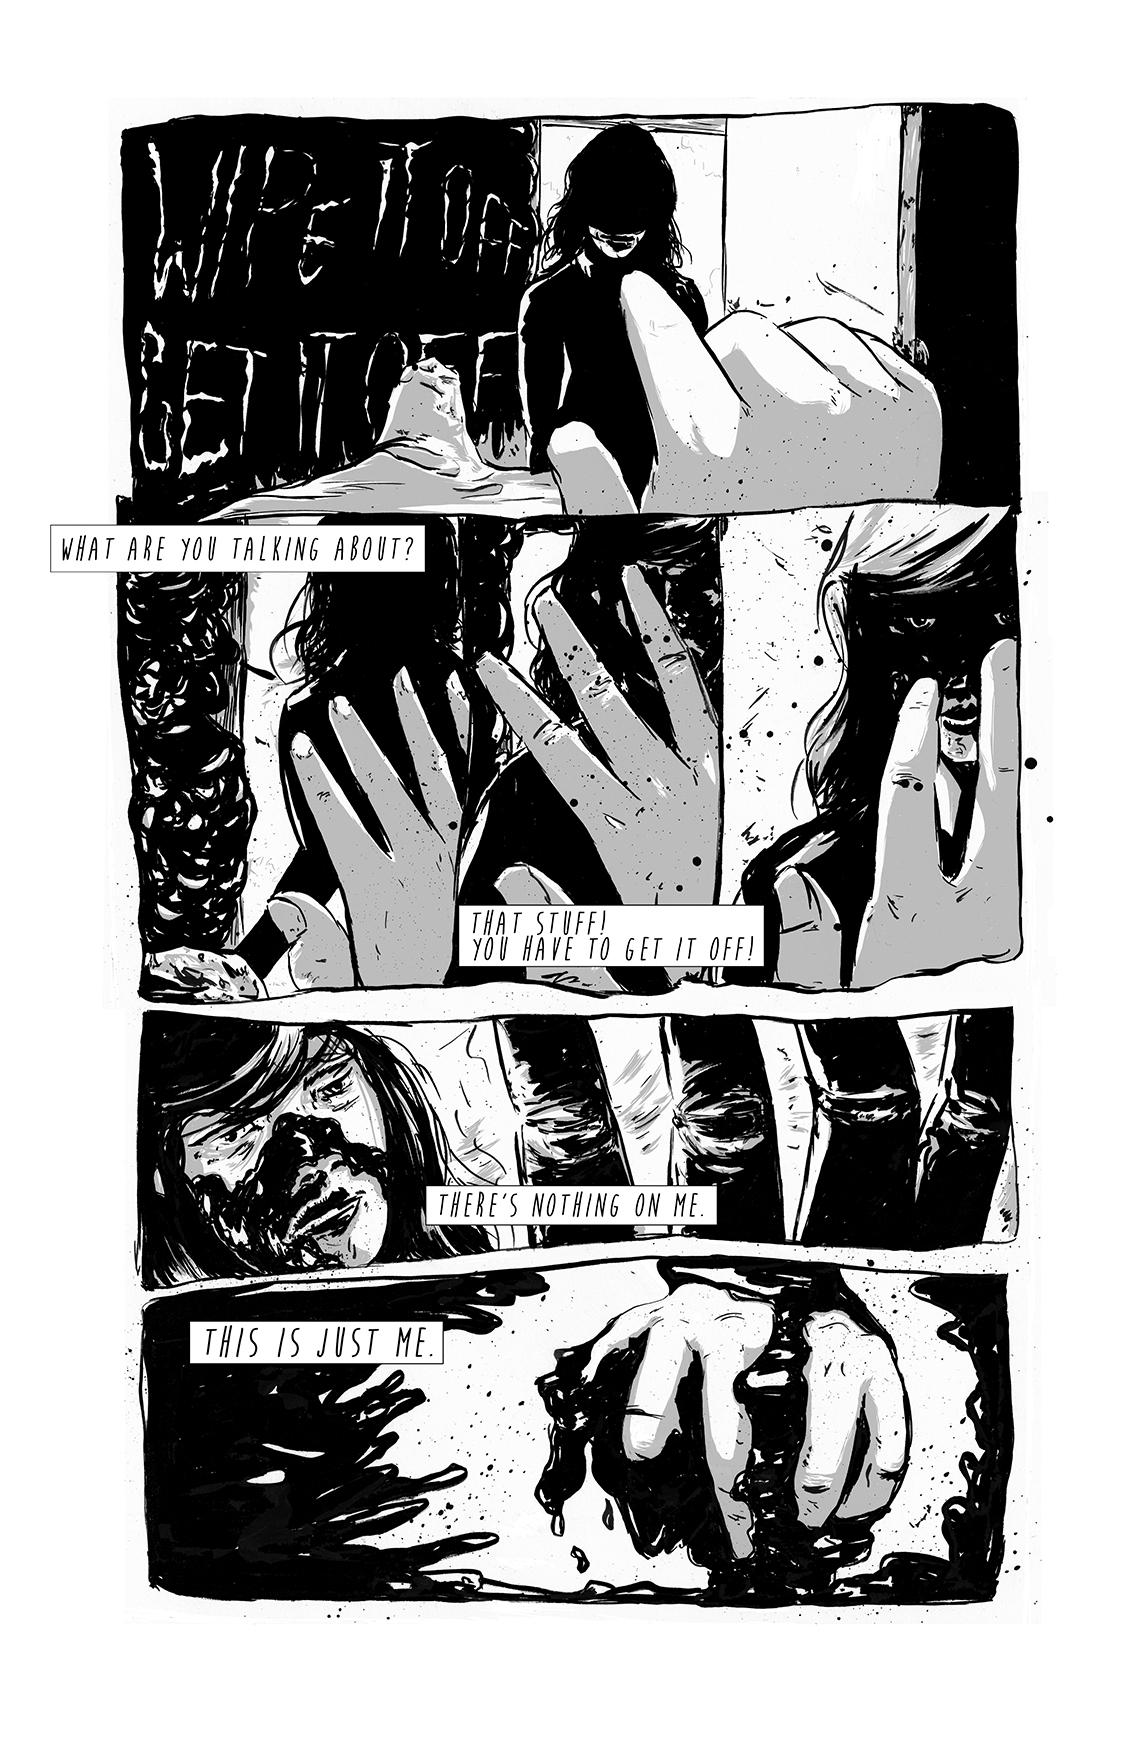 Eight Days Alone, page 9, by Sam Costello and Matthew Goik